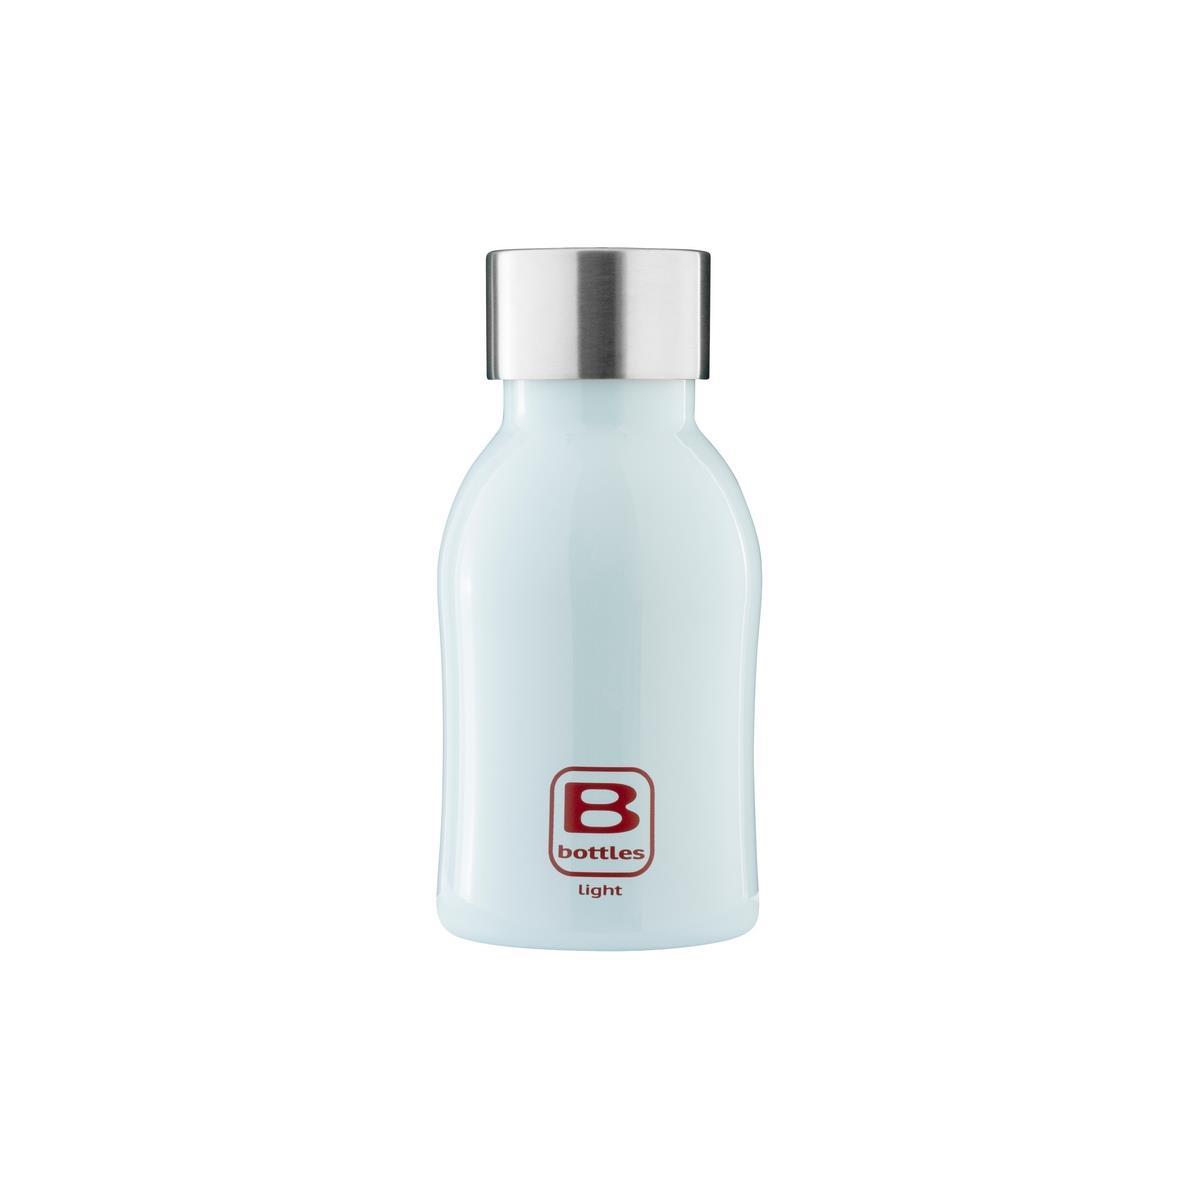 B Bottles Light - Light Blue - 350 ml - Bottiglia in acciaio inox 18/10 ultra leggera e compatta